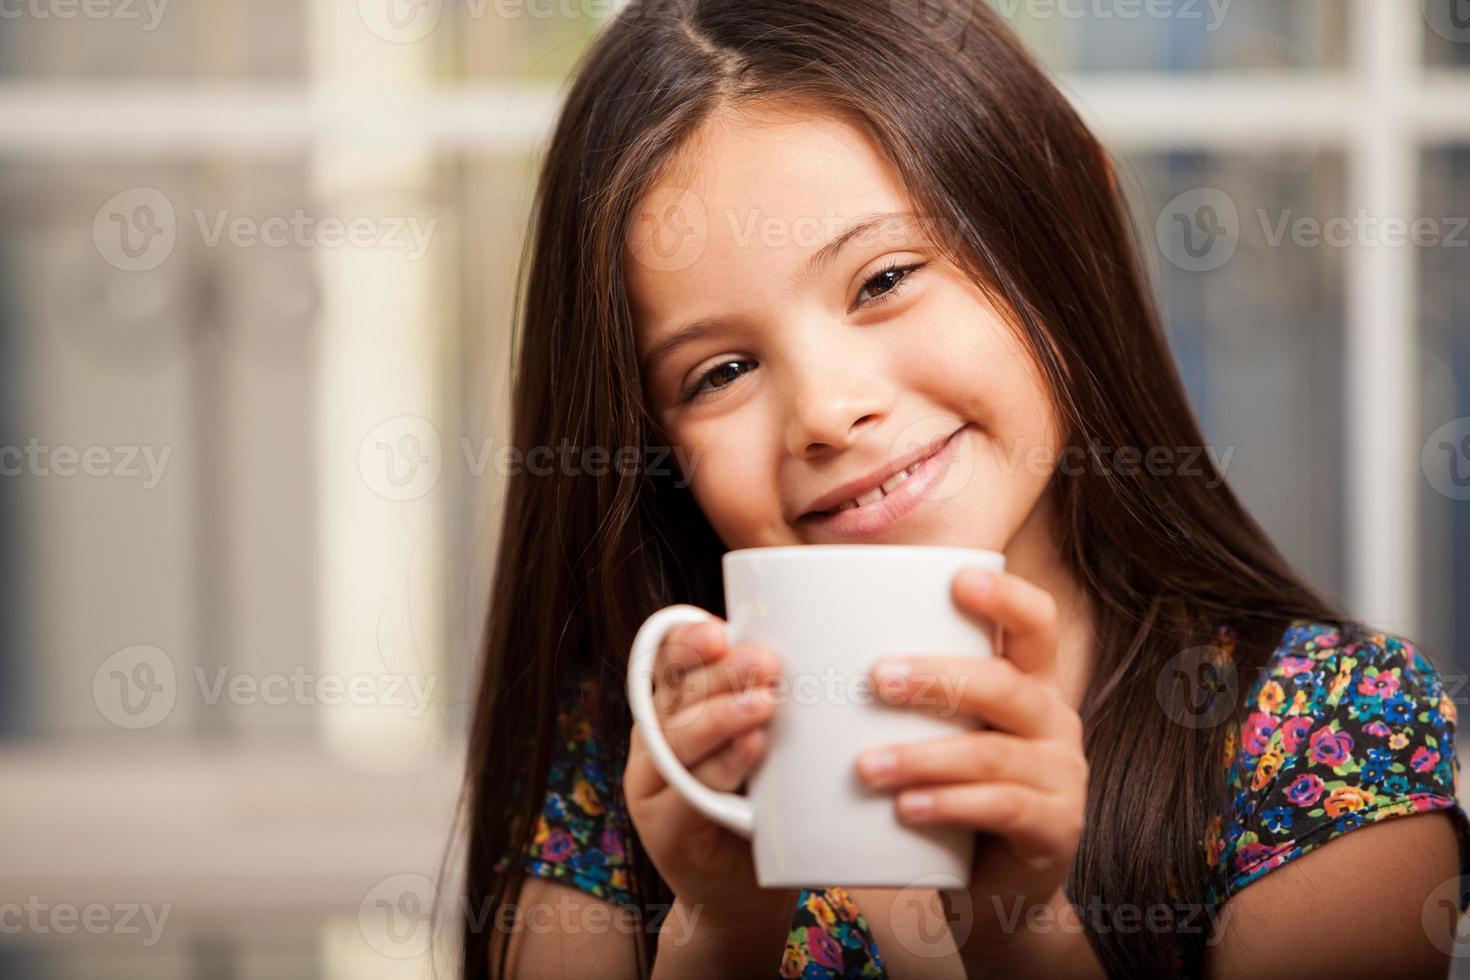 menina feliz bebendo chocolate foto